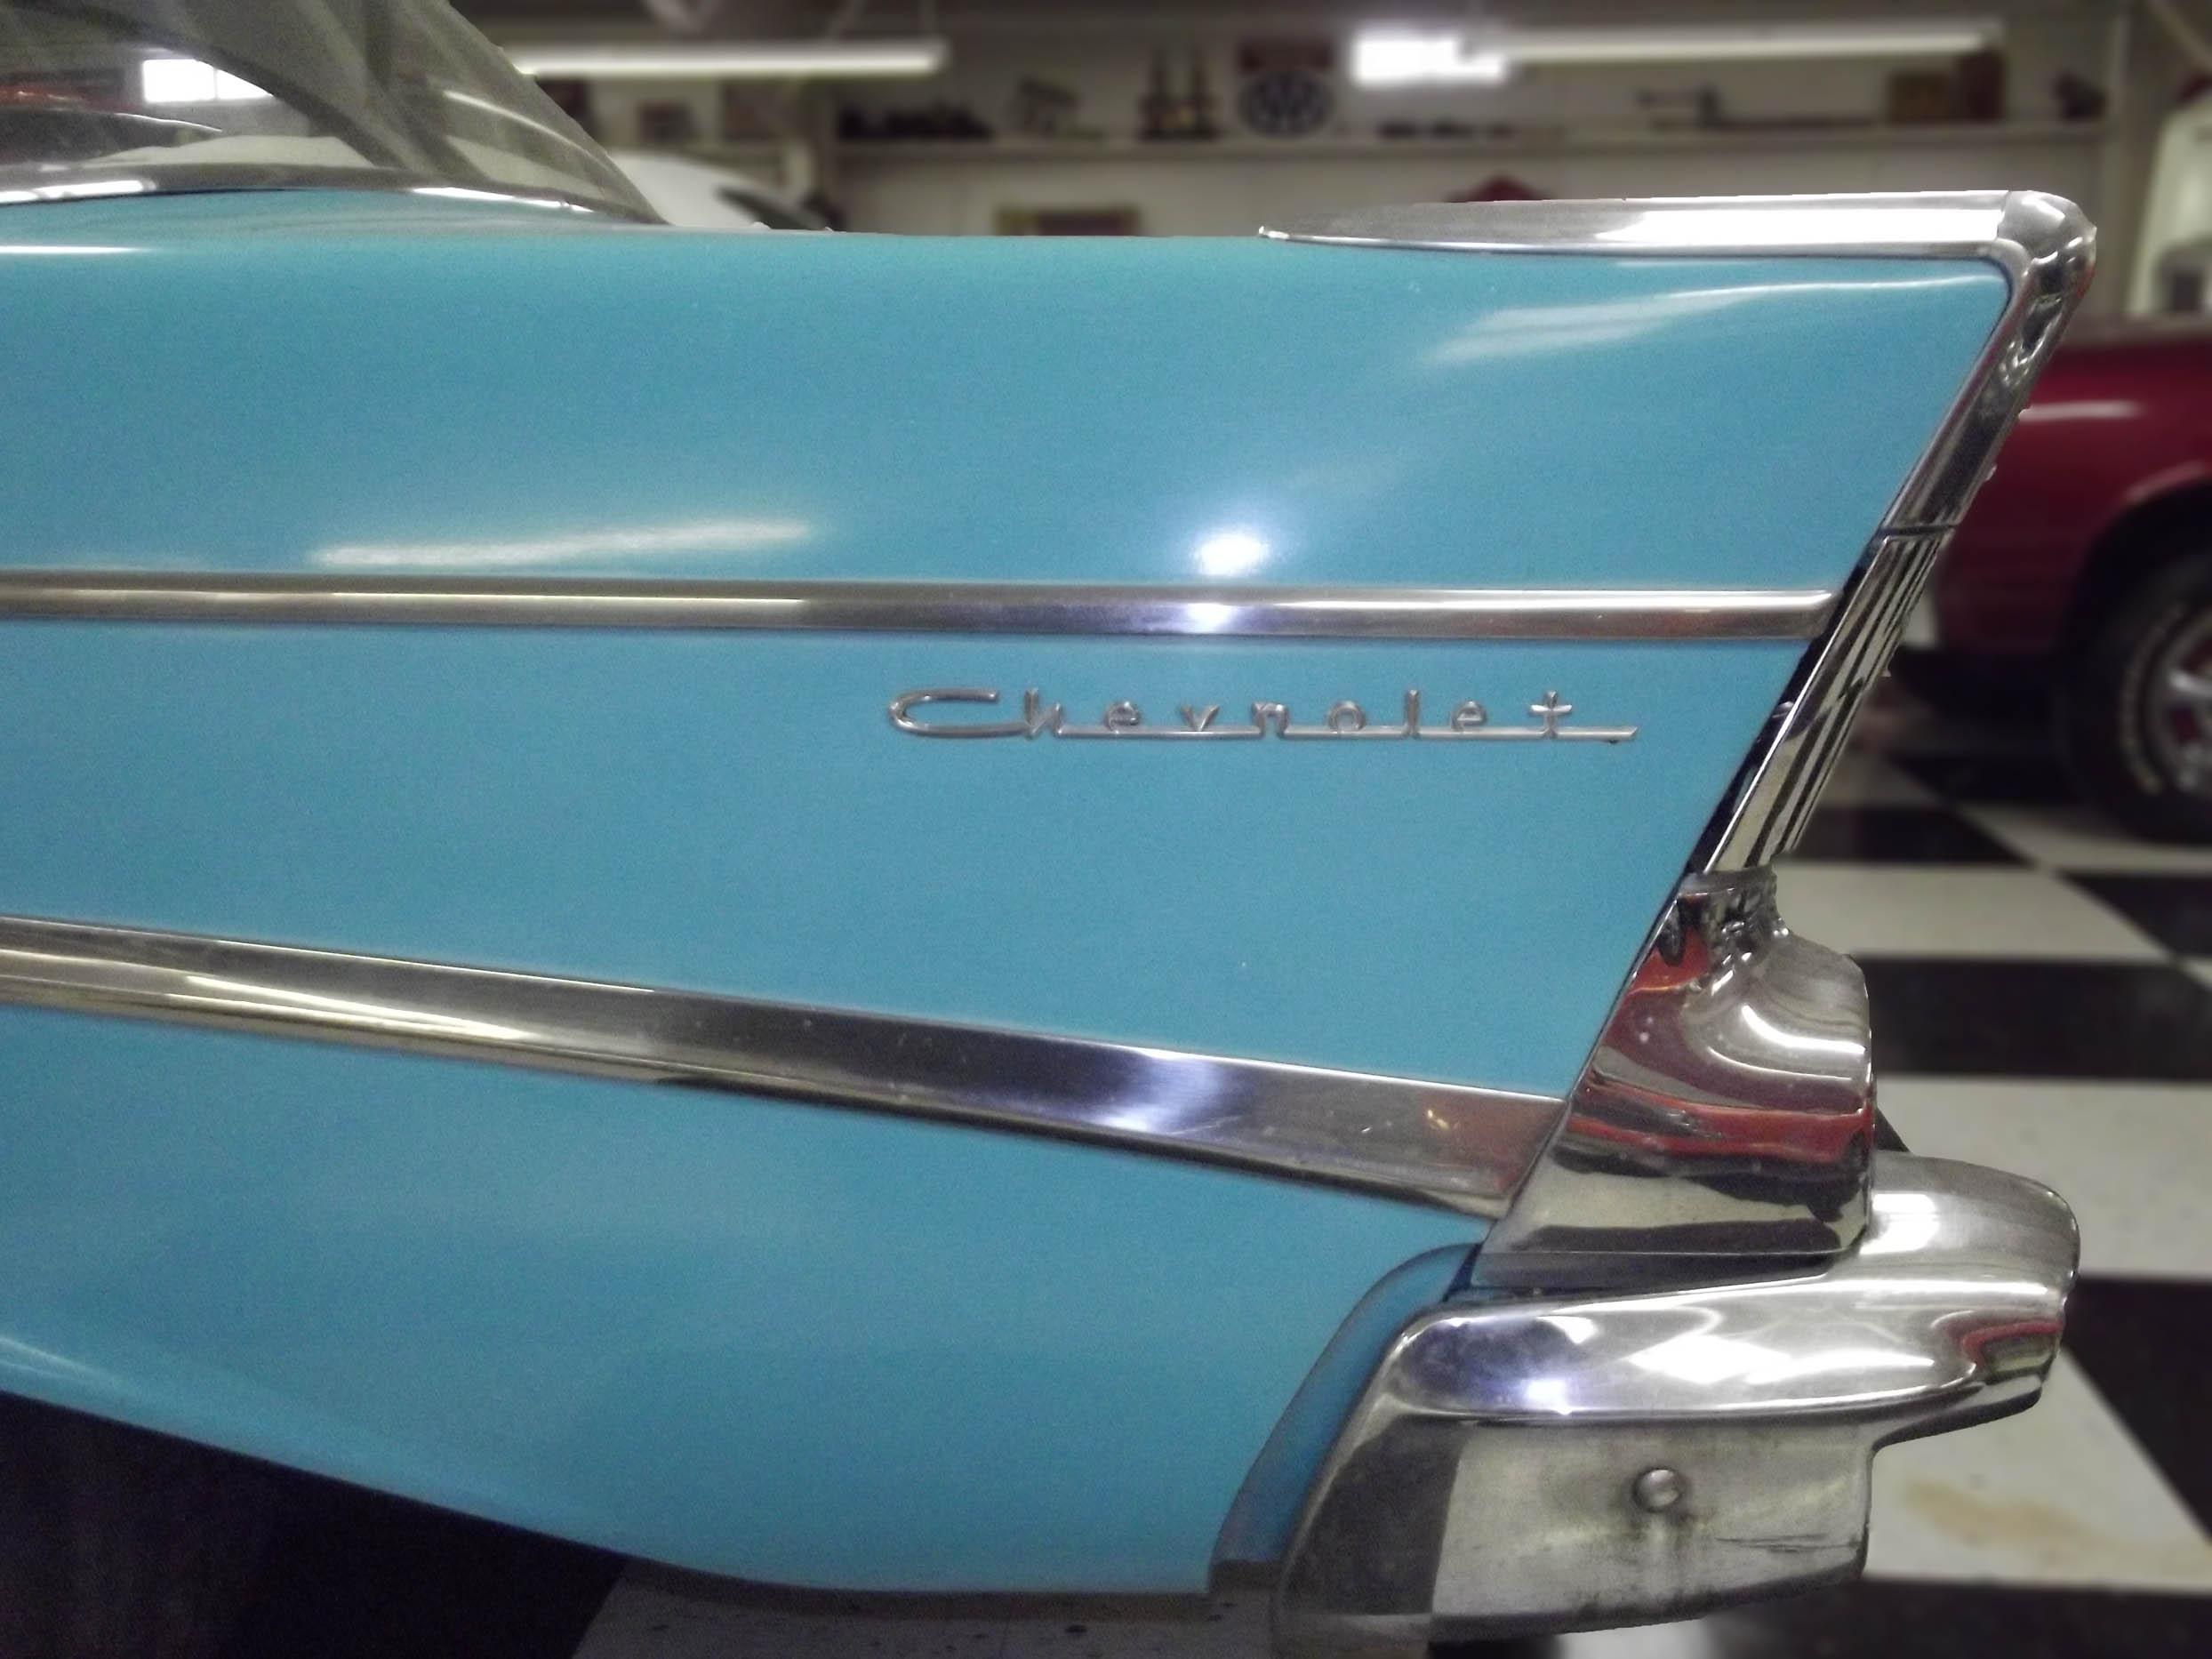 Pale blue car fin with silver trim